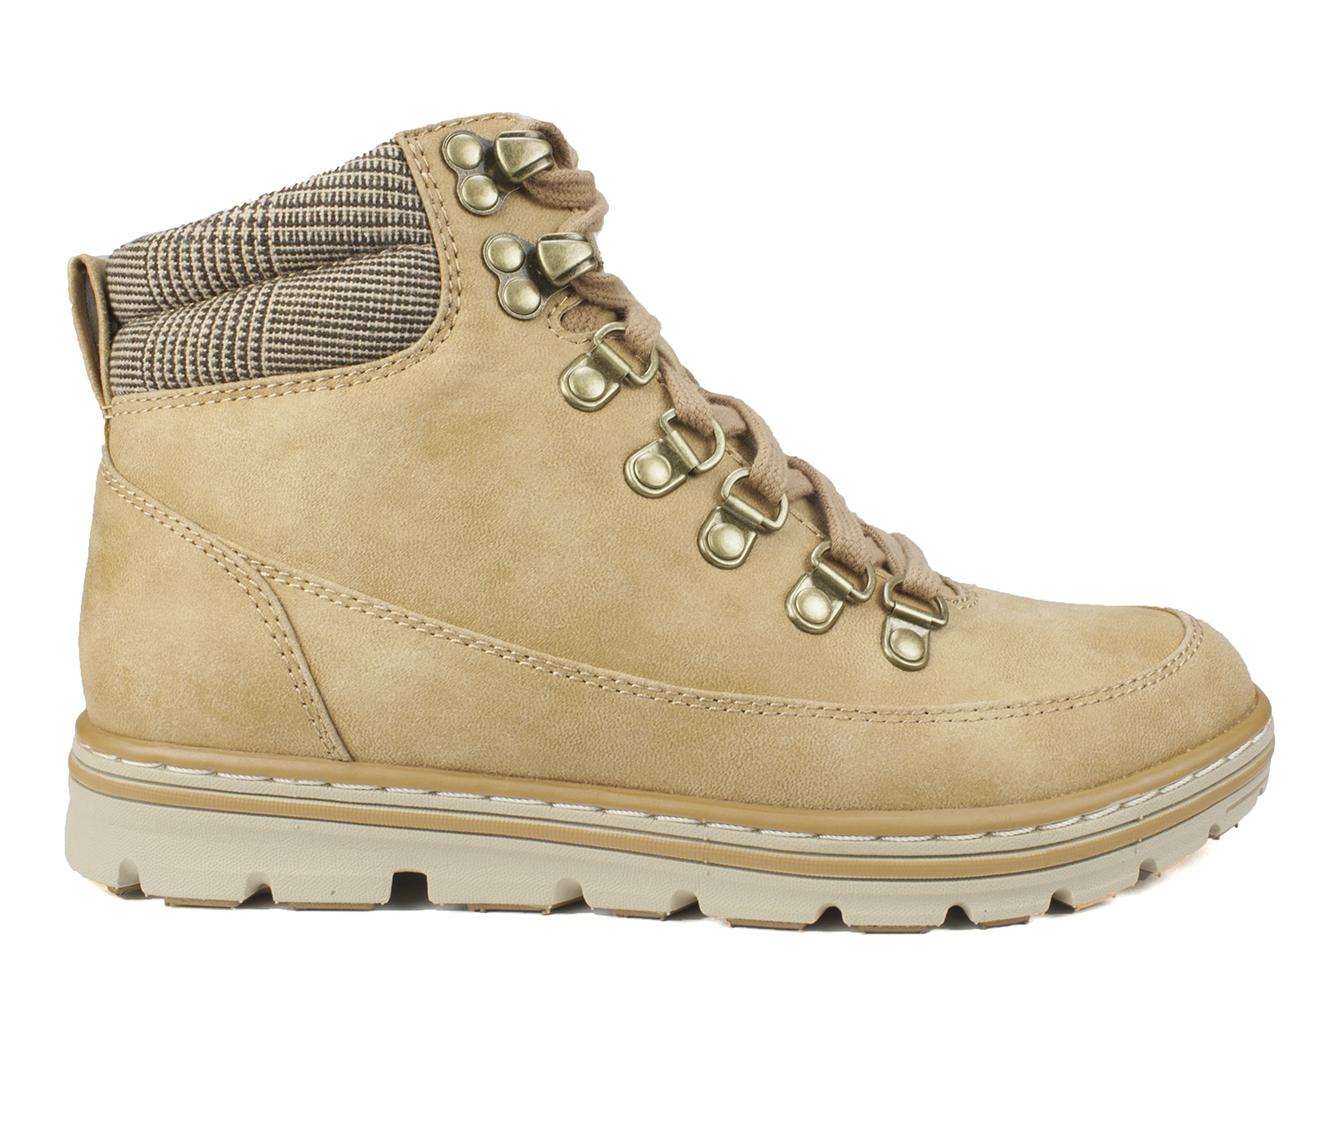 Cliffs Karmen Women's Boot (Brown Faux Leather)